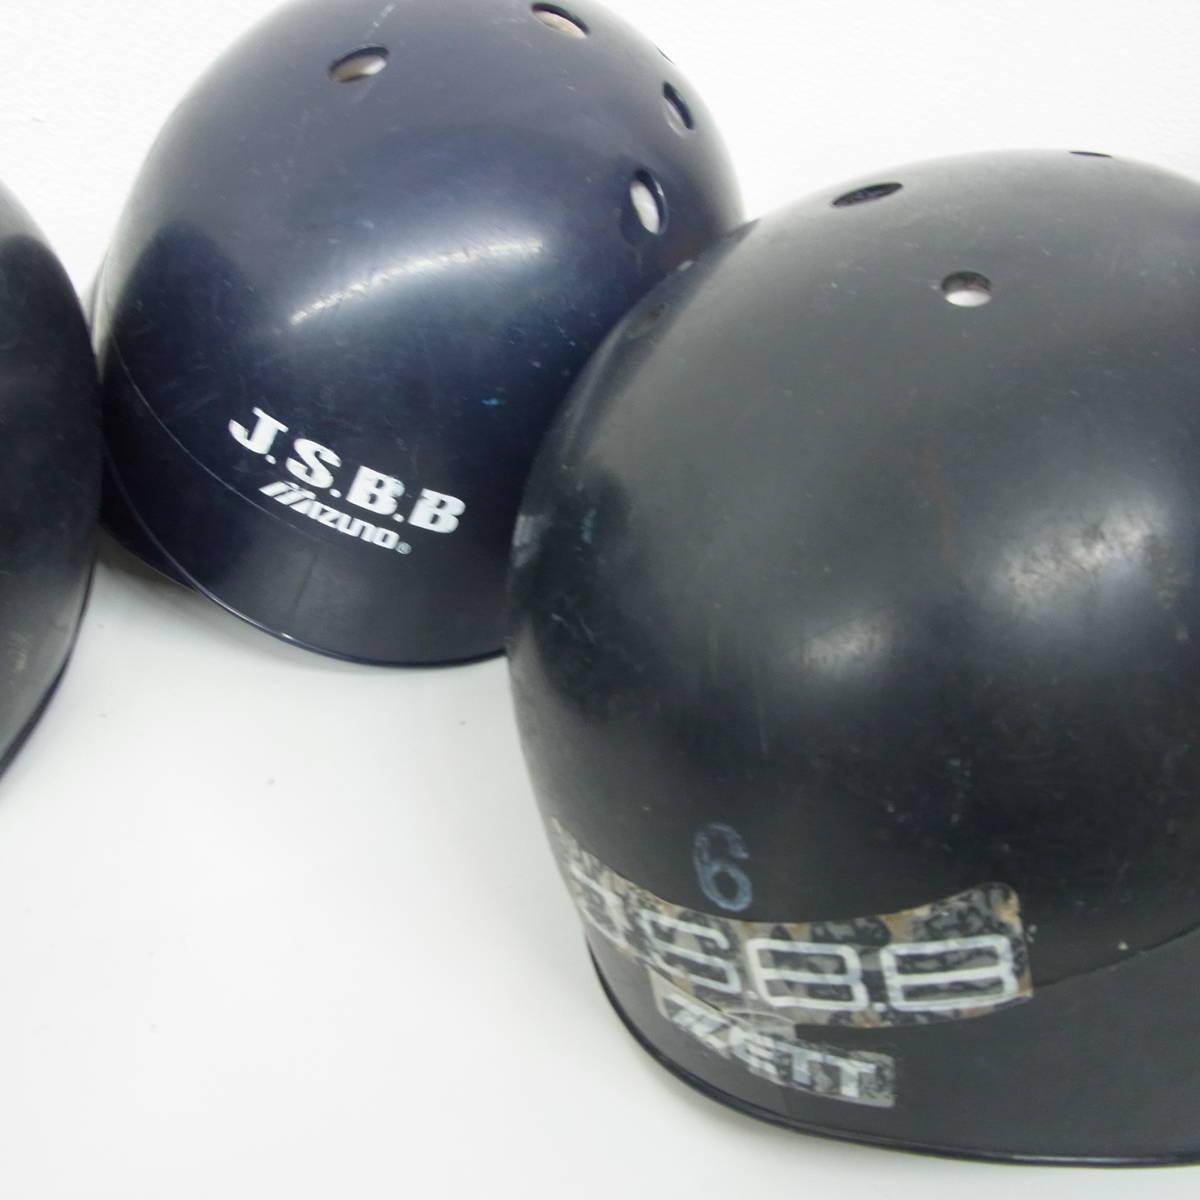 MIZUNO ミズノ ZETT ゼット 野球 ベースボール ヘルメット 5点セット J.S.B.B L×2 M×2 O×1 バッグ付き 難有特価_画像2